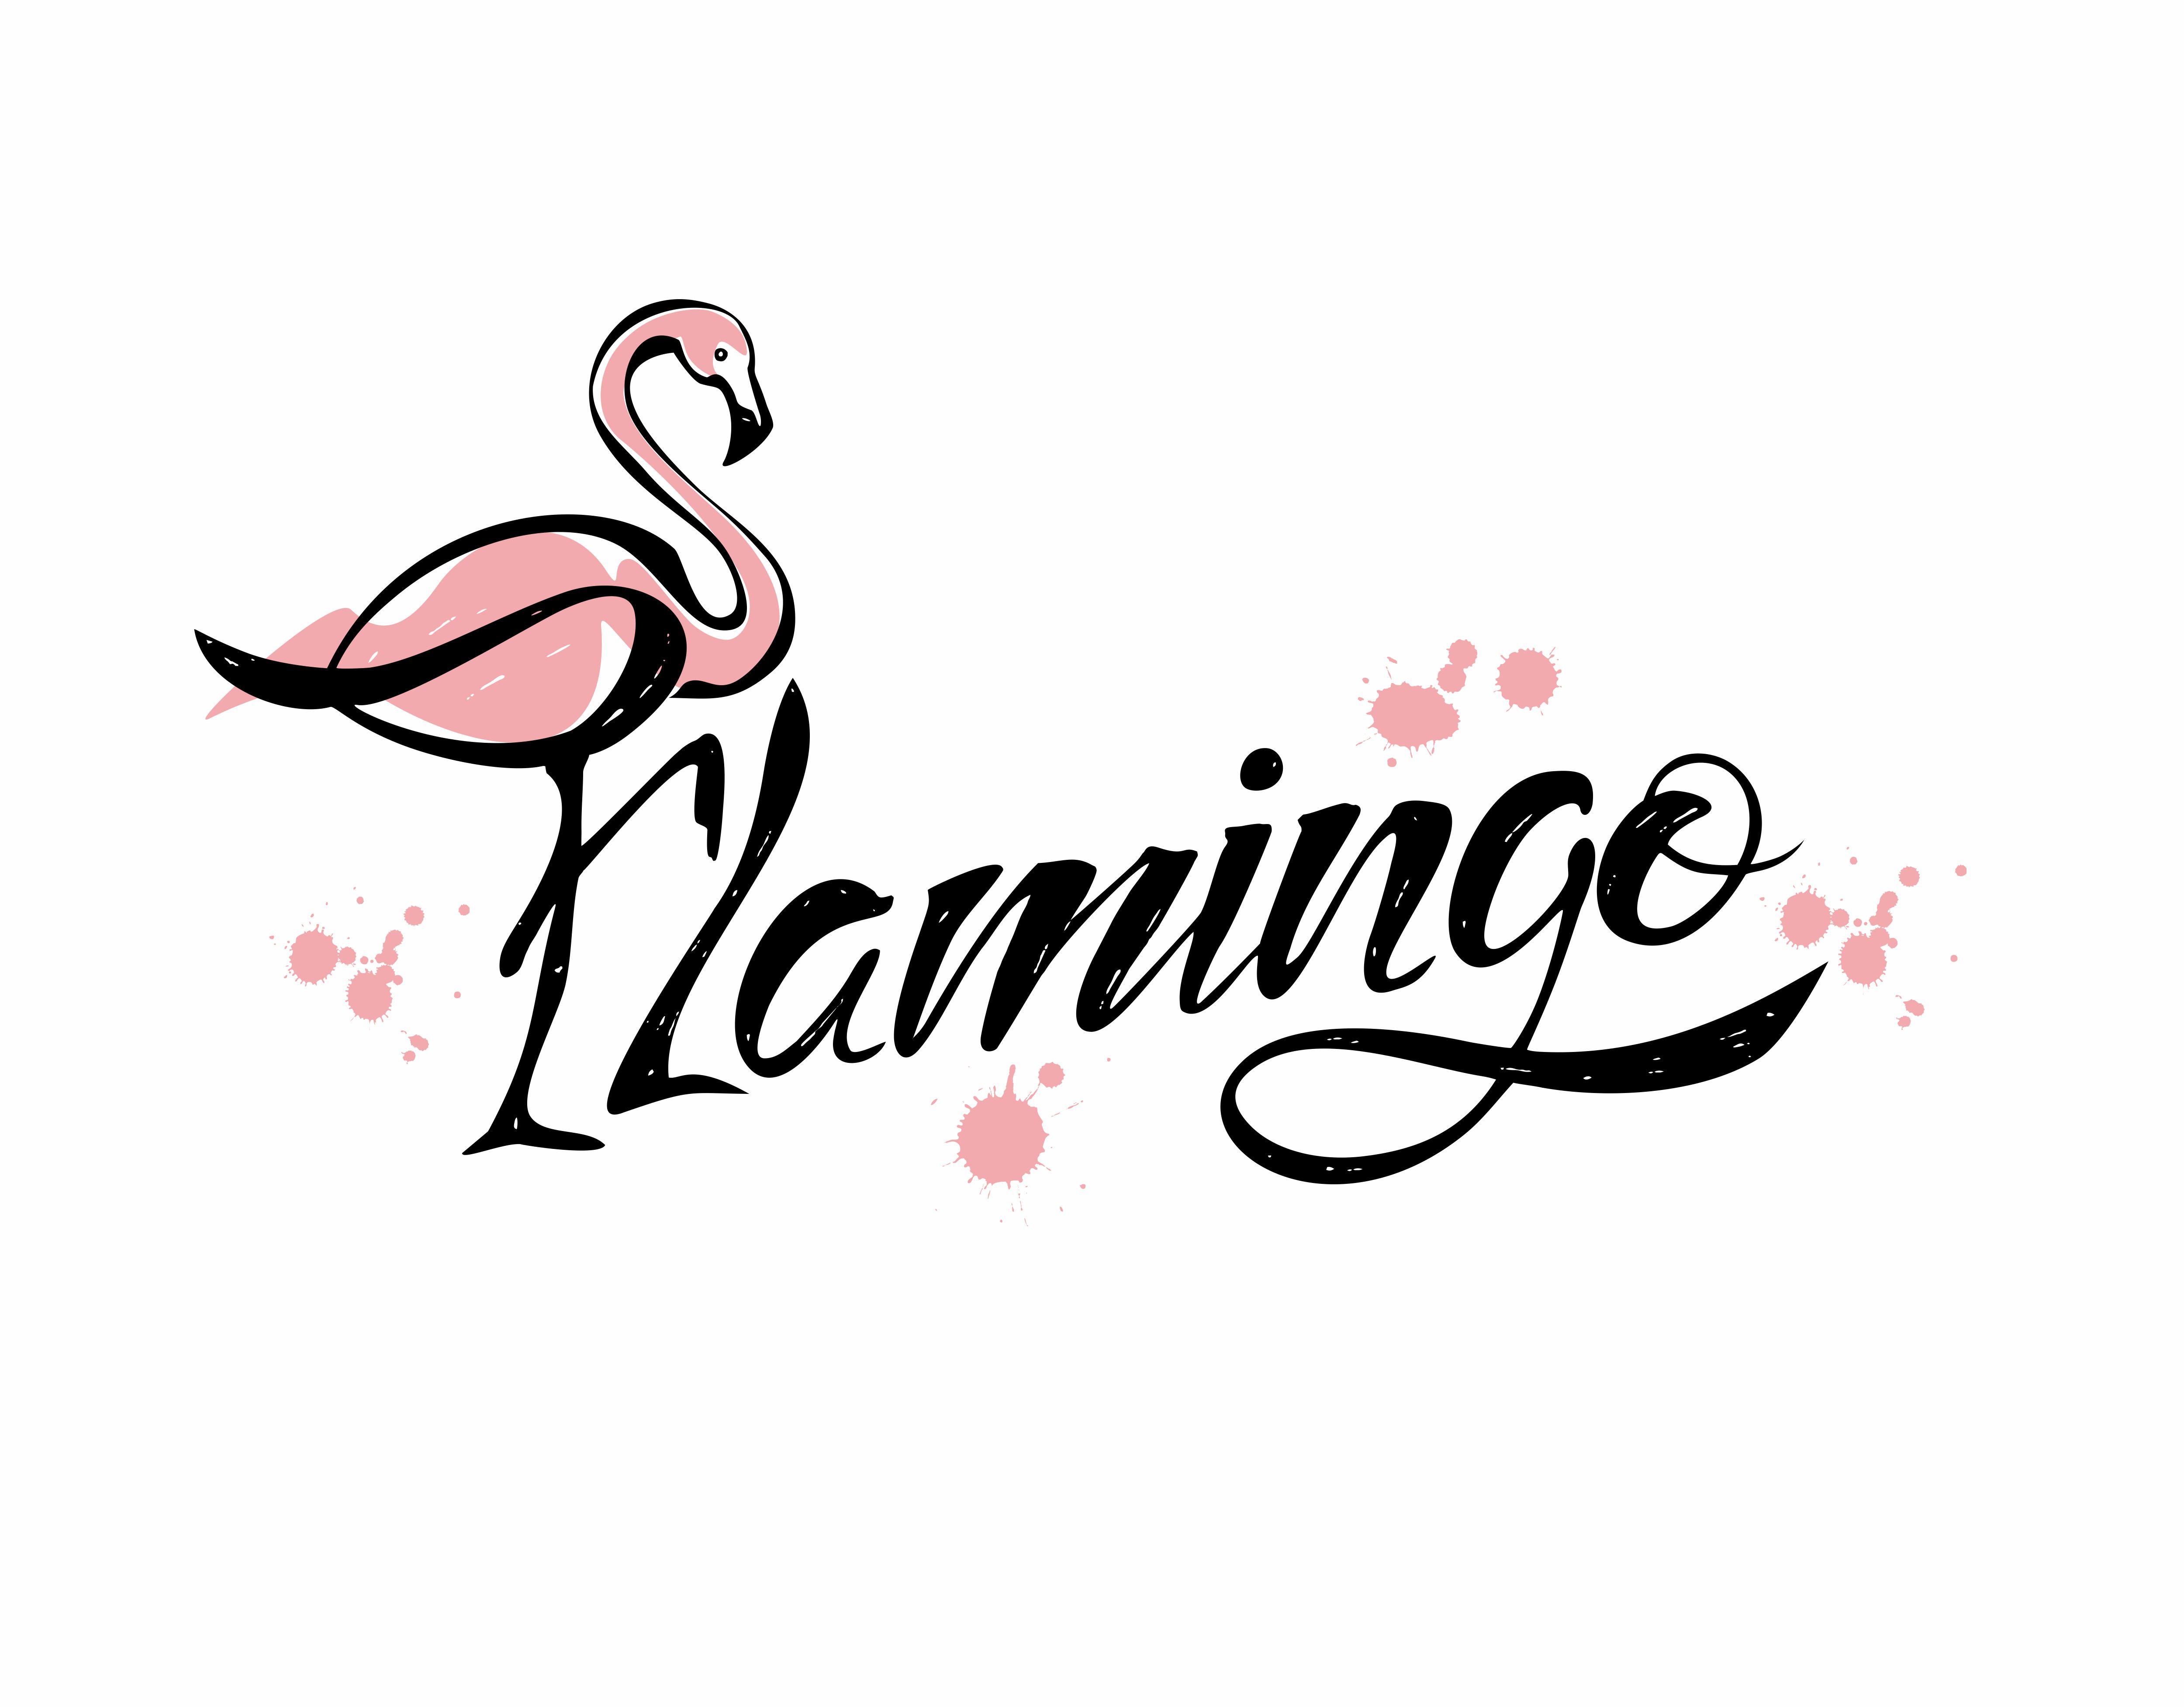 Flamingo Lettering Stylish Inscription Blots Vector